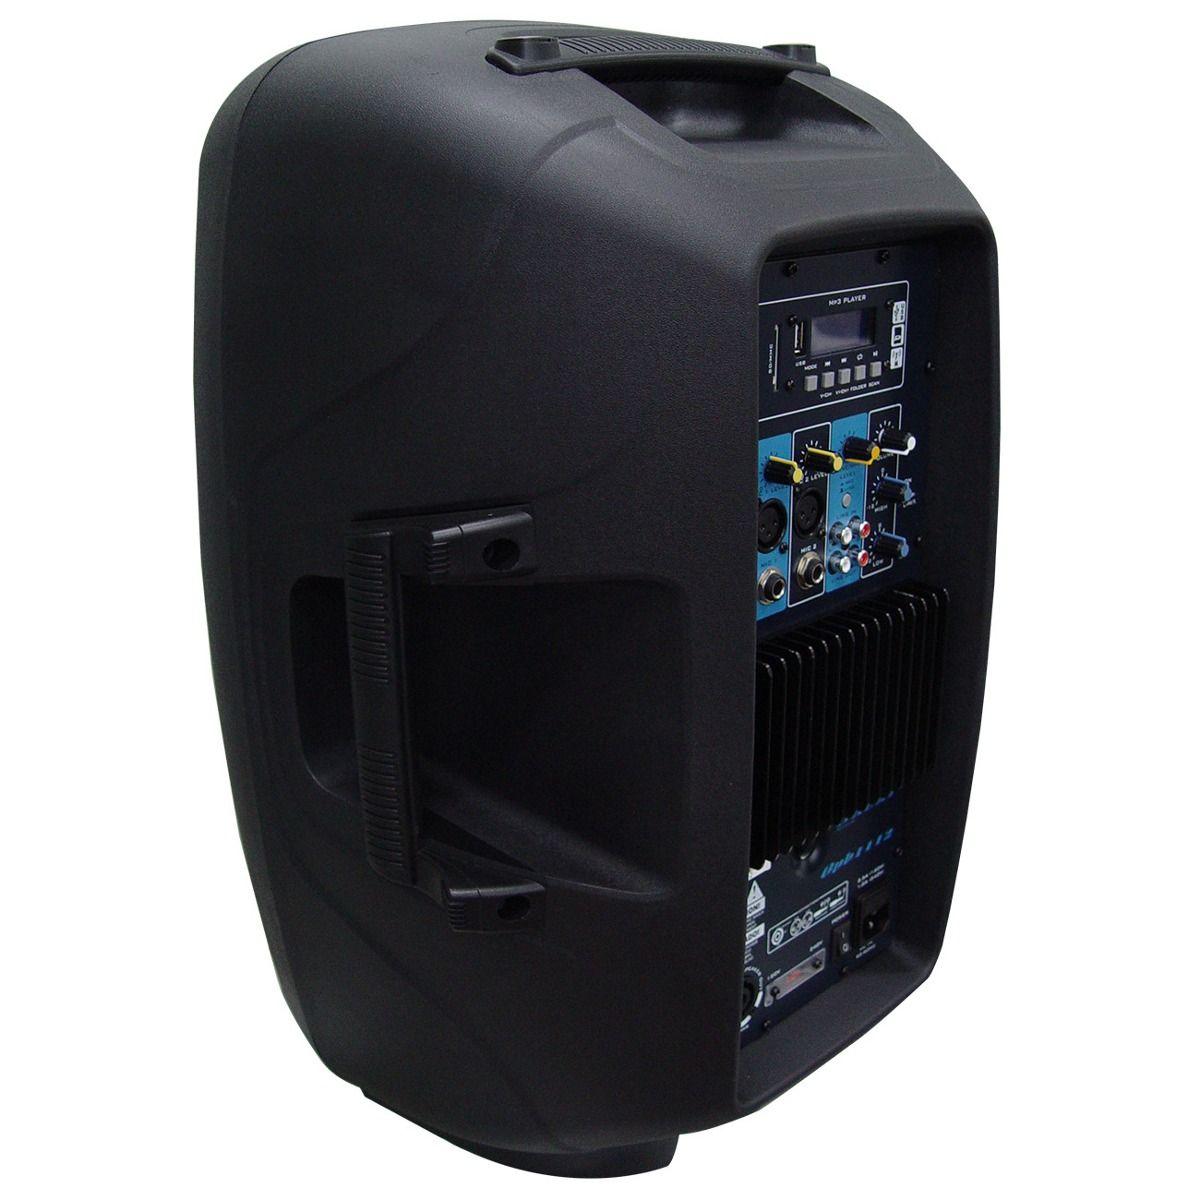 Kit Caixa de Som Oneal Bluetooth Ativa Passiva Opb1112 Ob1112 475w Rms